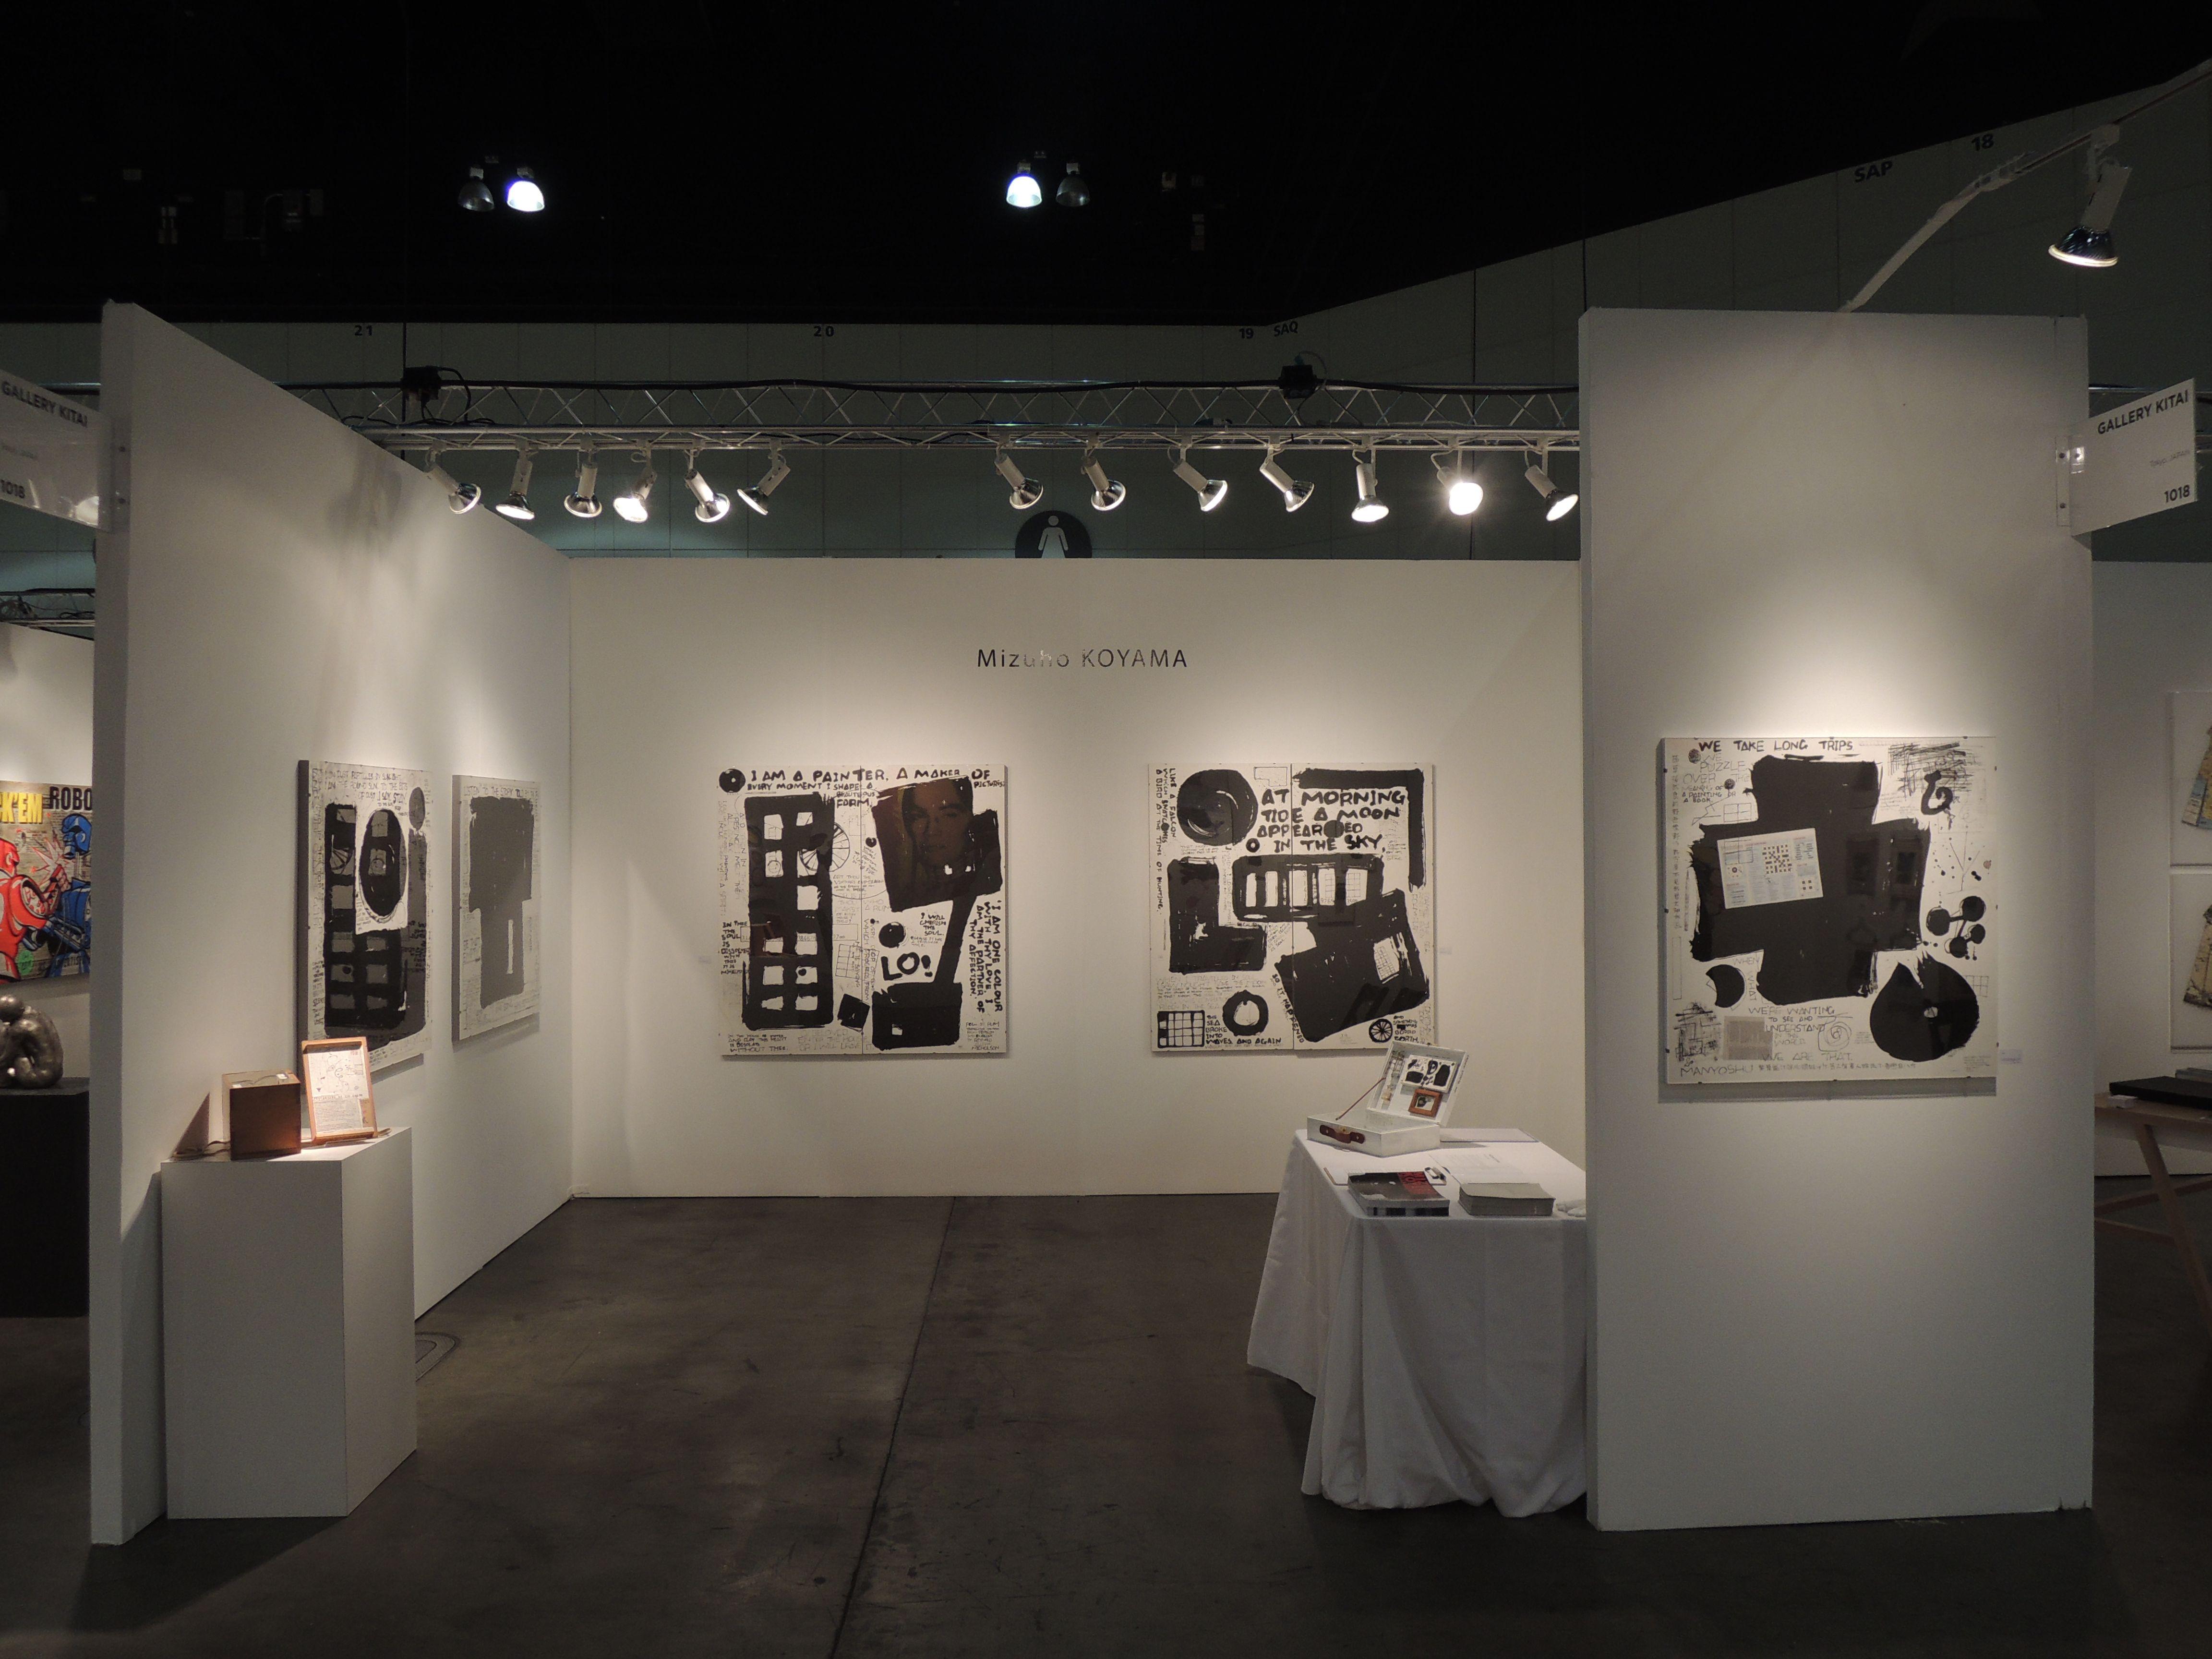 La art show 2015 for Craft shows in louisiana